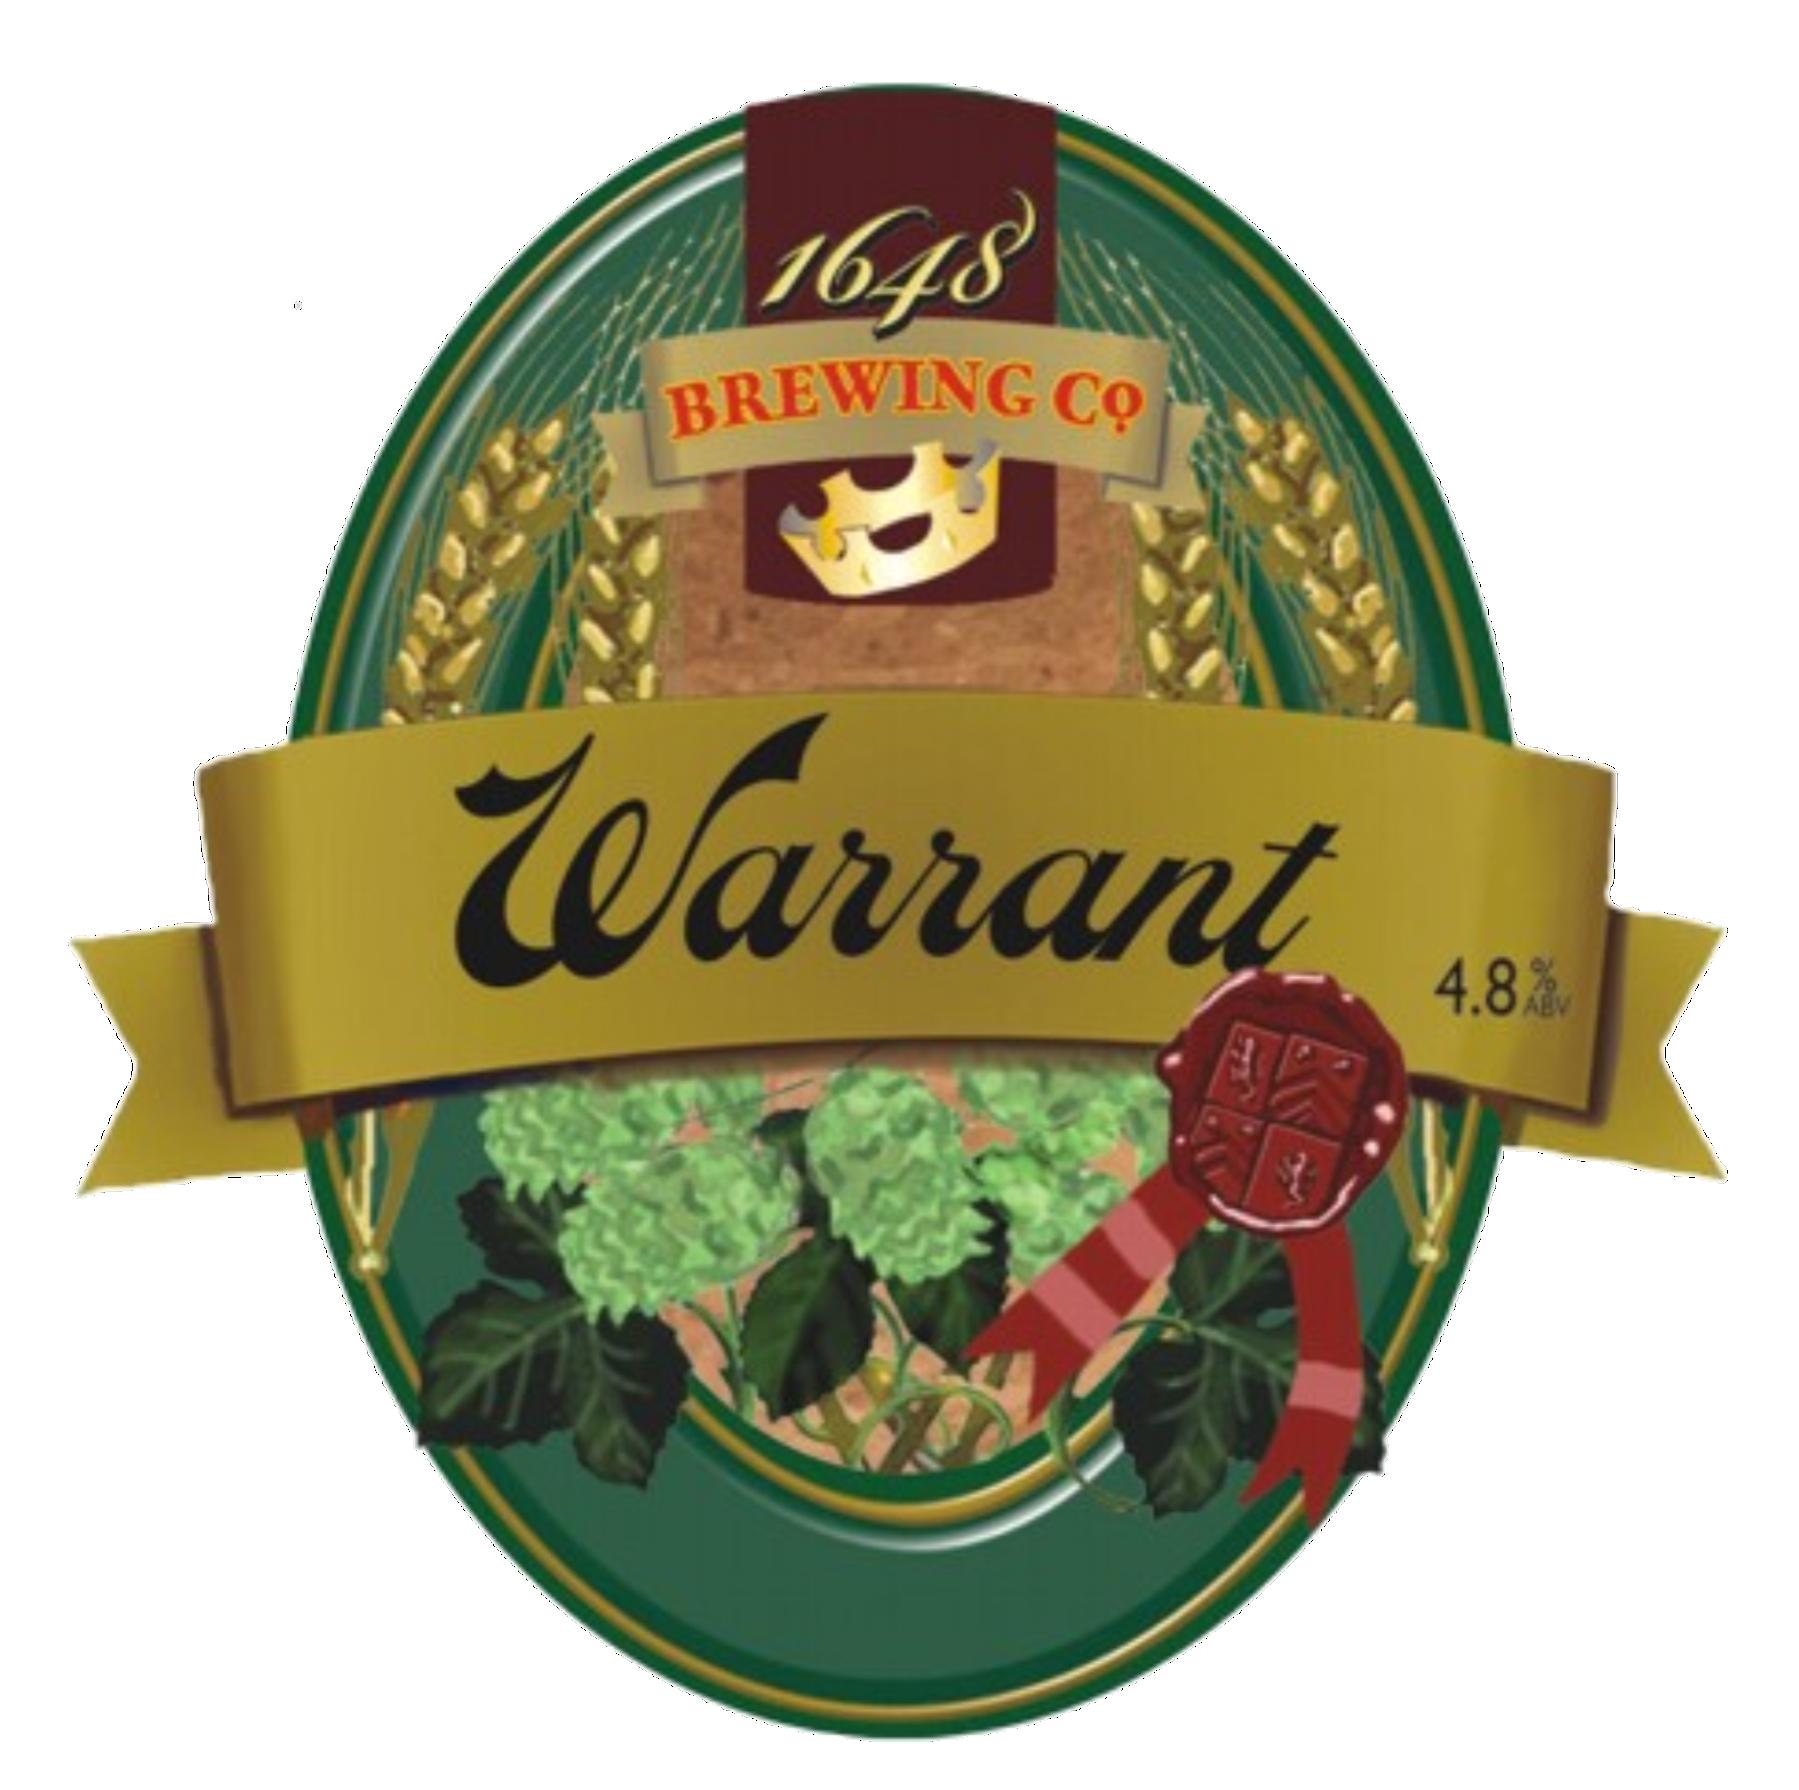 Warrant 4.8%